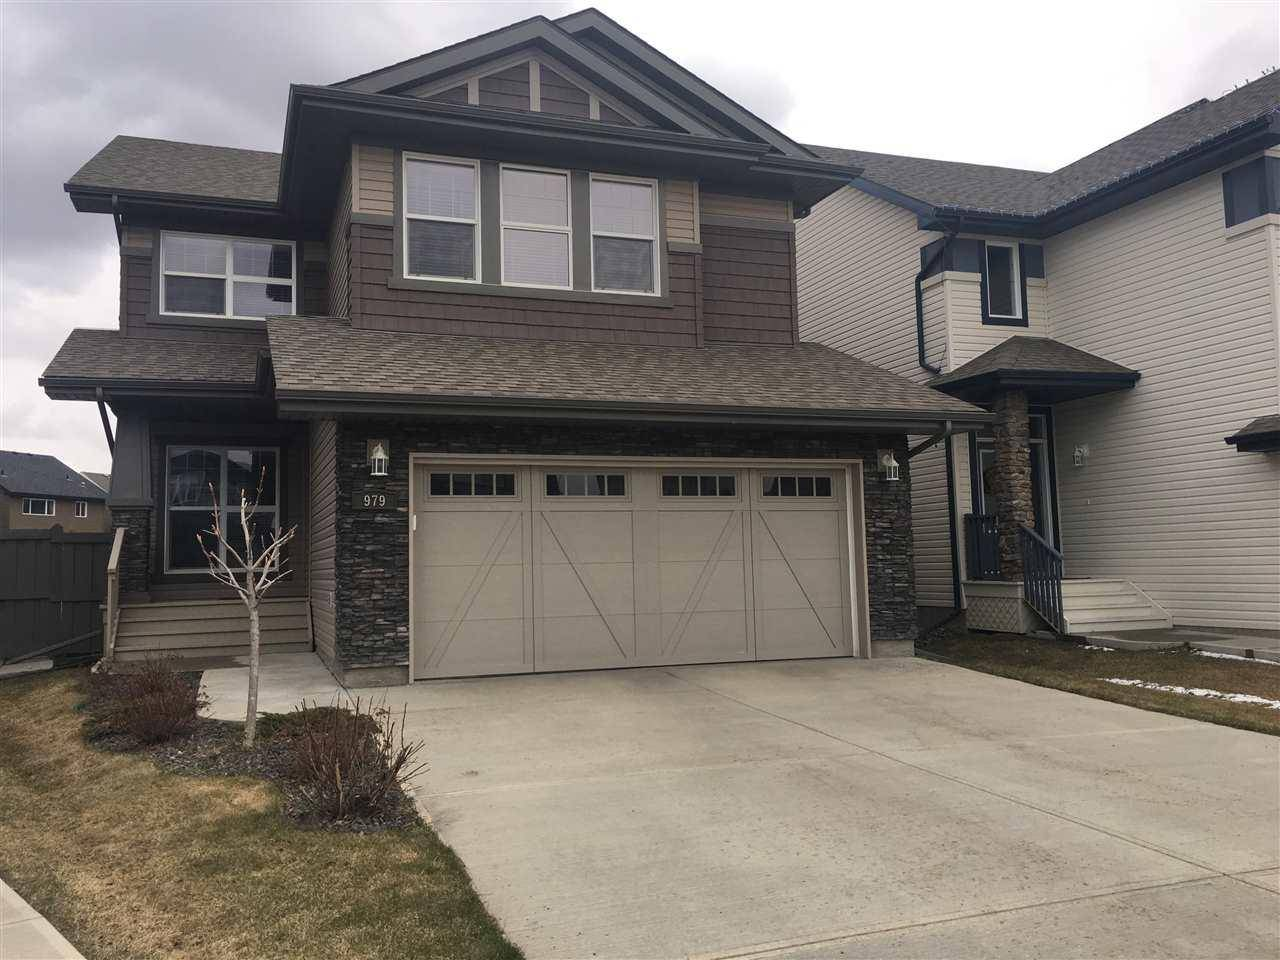 House for sale at 979 175 St Sw Edmonton Alberta - MLS: E4154901